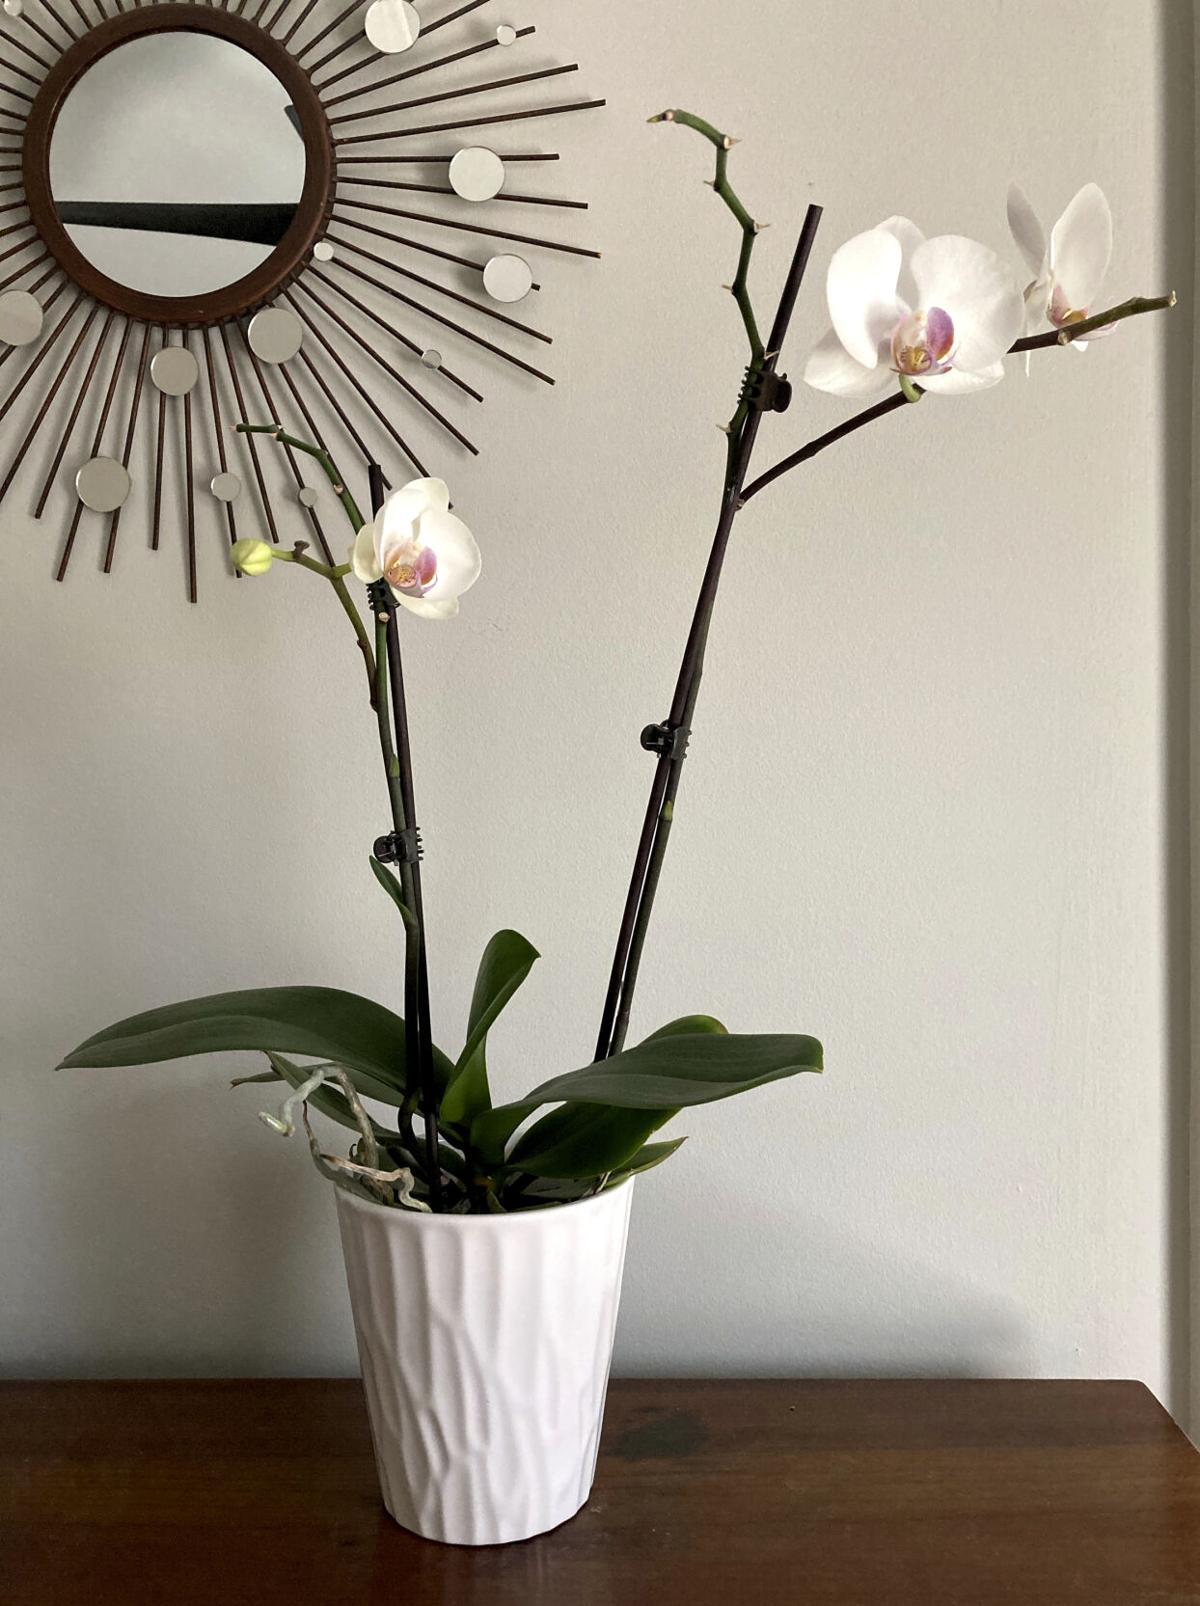 Gardening-Orchids Everywhere